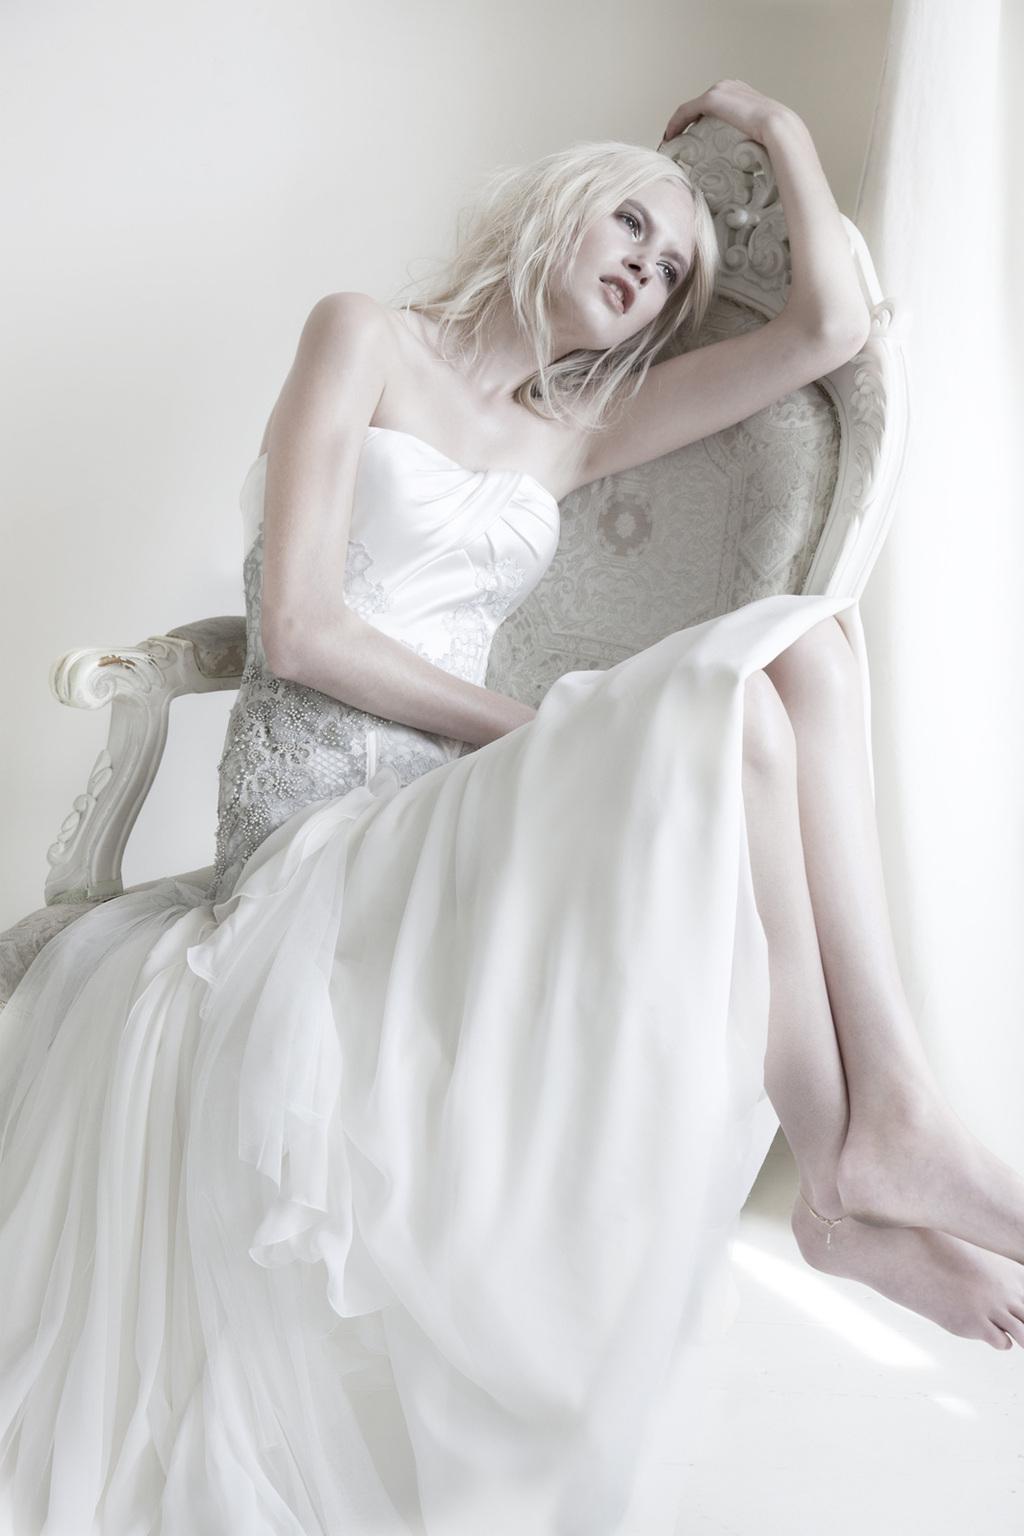 Mariana-hardwick-wedding-dress-2013-bridal-celeste.full